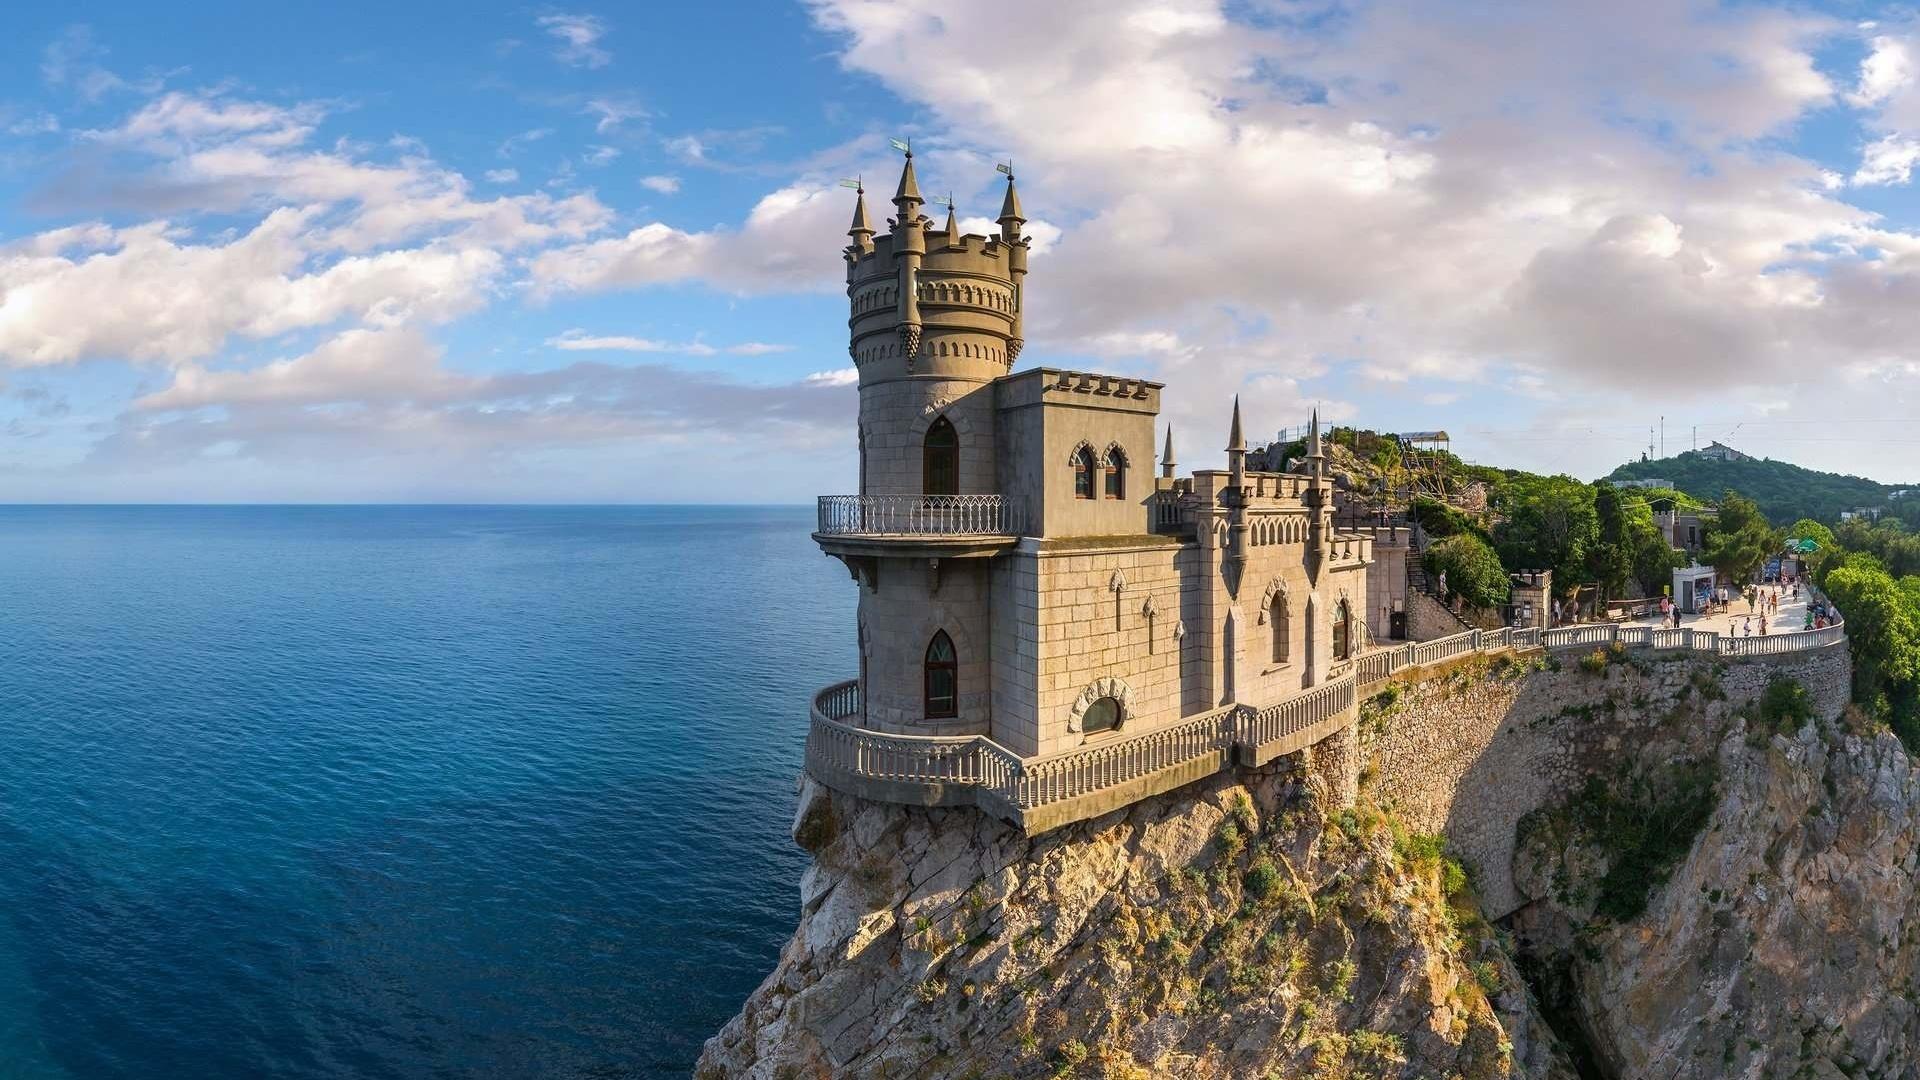 Весь Крым (Керчь, Феодосия, Судак, Алушта, Ялта, Бахчисарай, Саки)